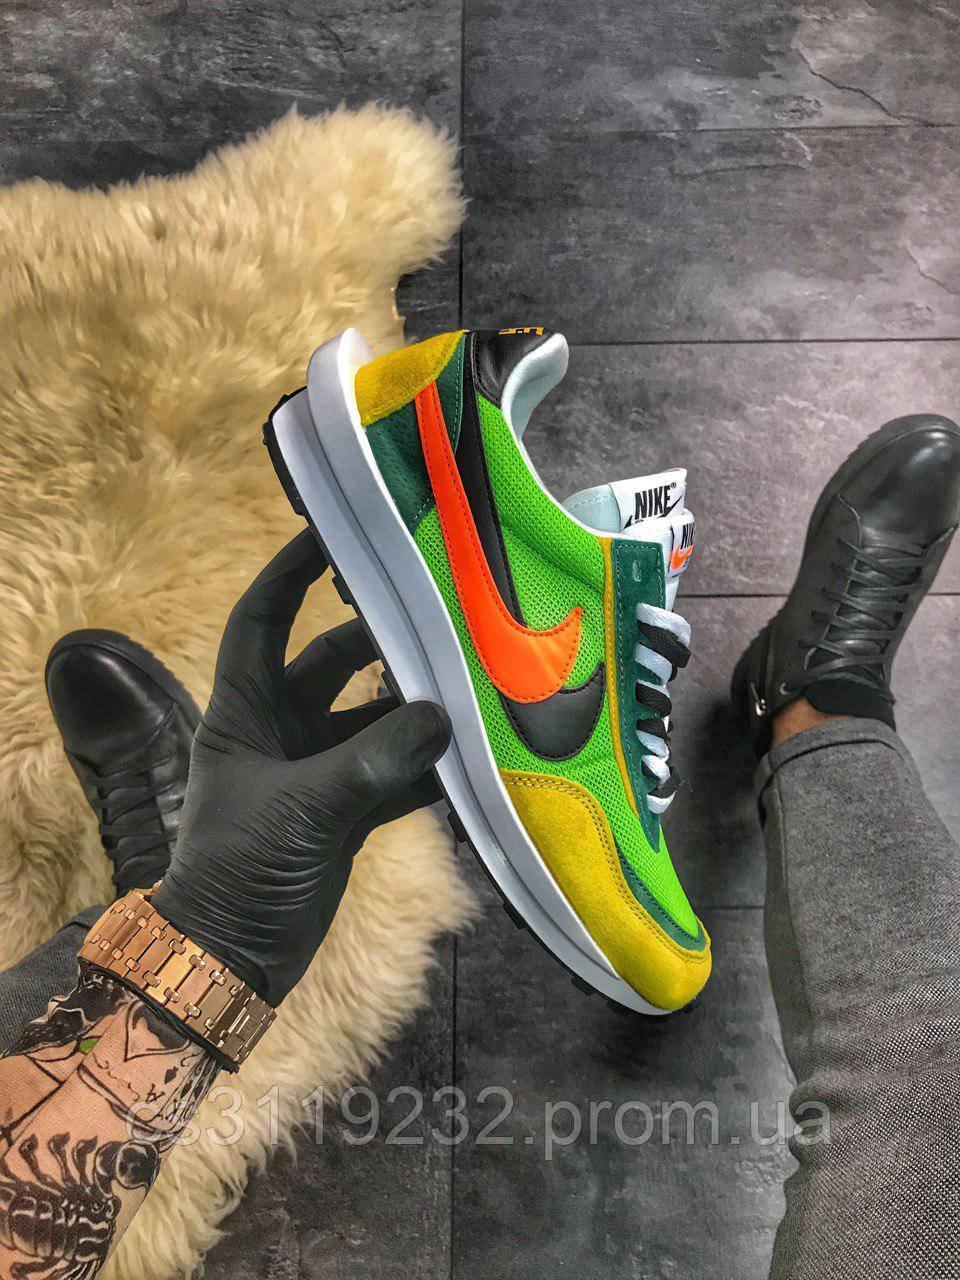 Мужские кроссовки Nike LD Waffle Sacai Green